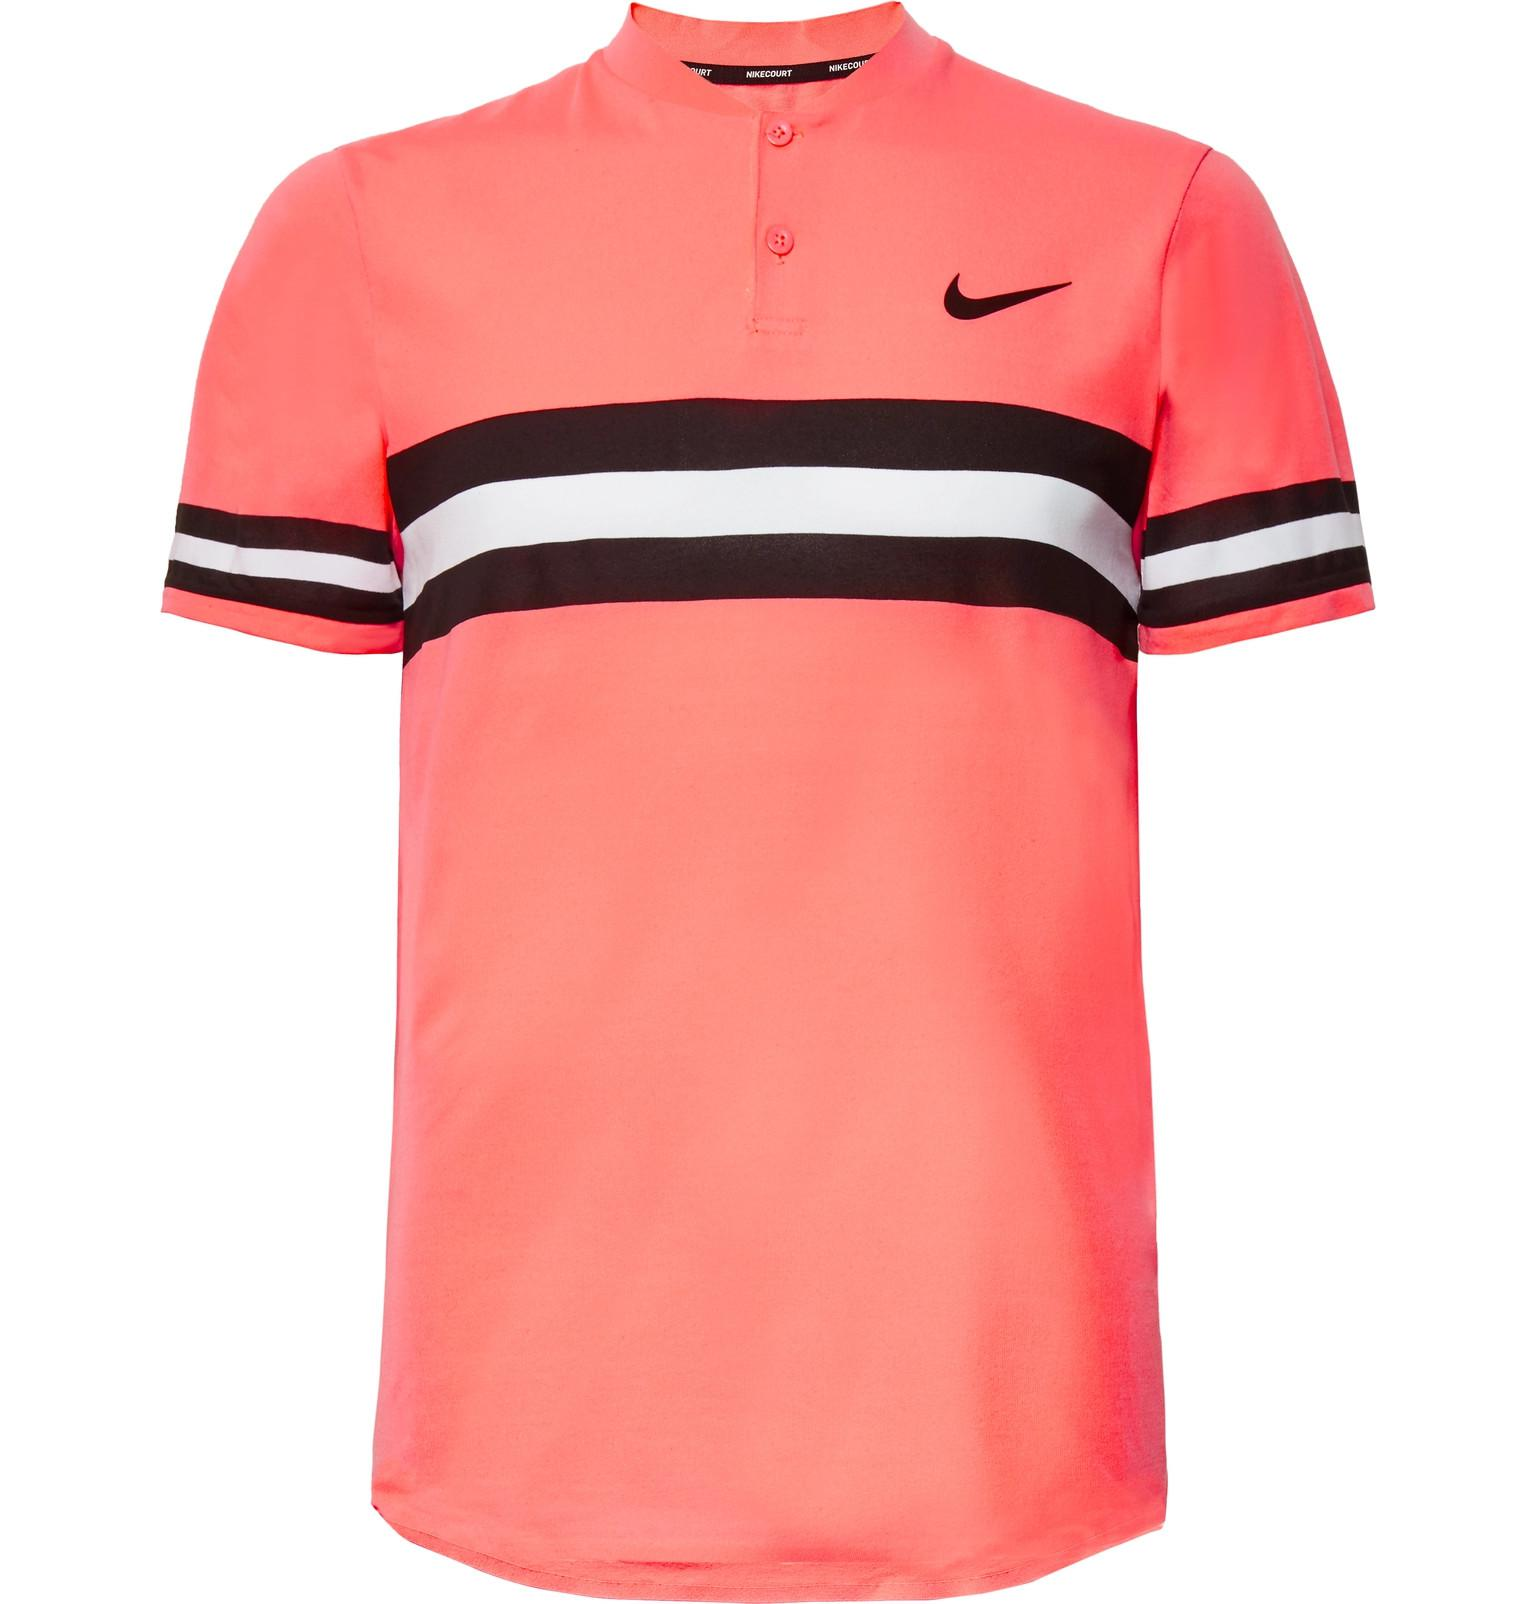 87f6f91f4 Nike Nikecourt Advantage Dri-fit Tennis Polo Shirt in Pink for Men ...